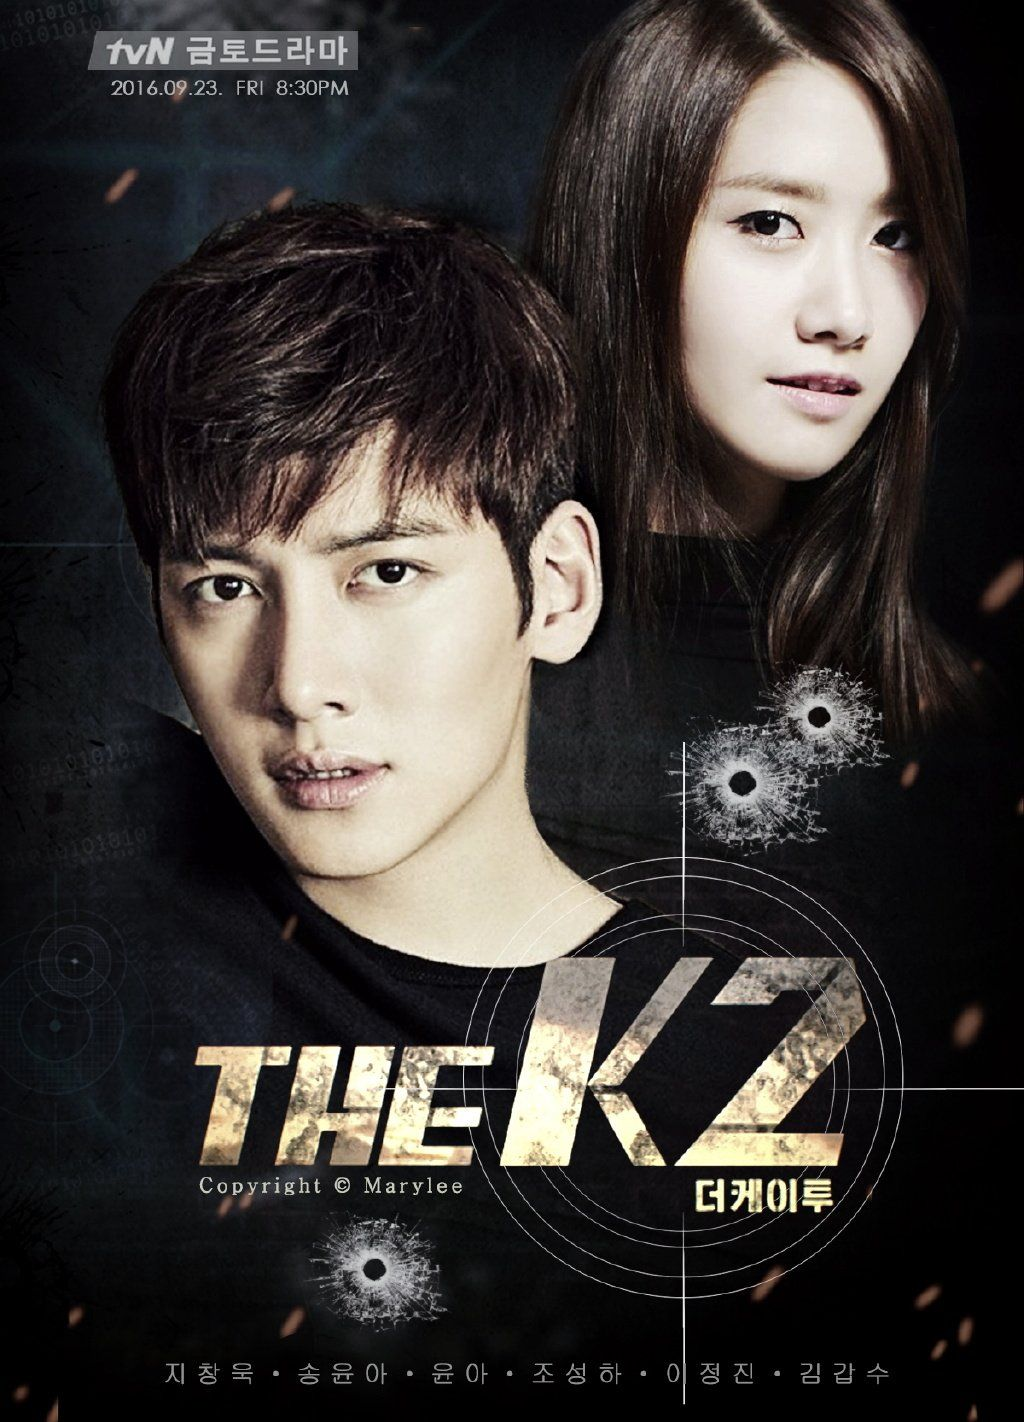 Jichangwook Thailand By Naja On Twitter The K2 Korean Drama Korean Drama Movies Korean Drama Best